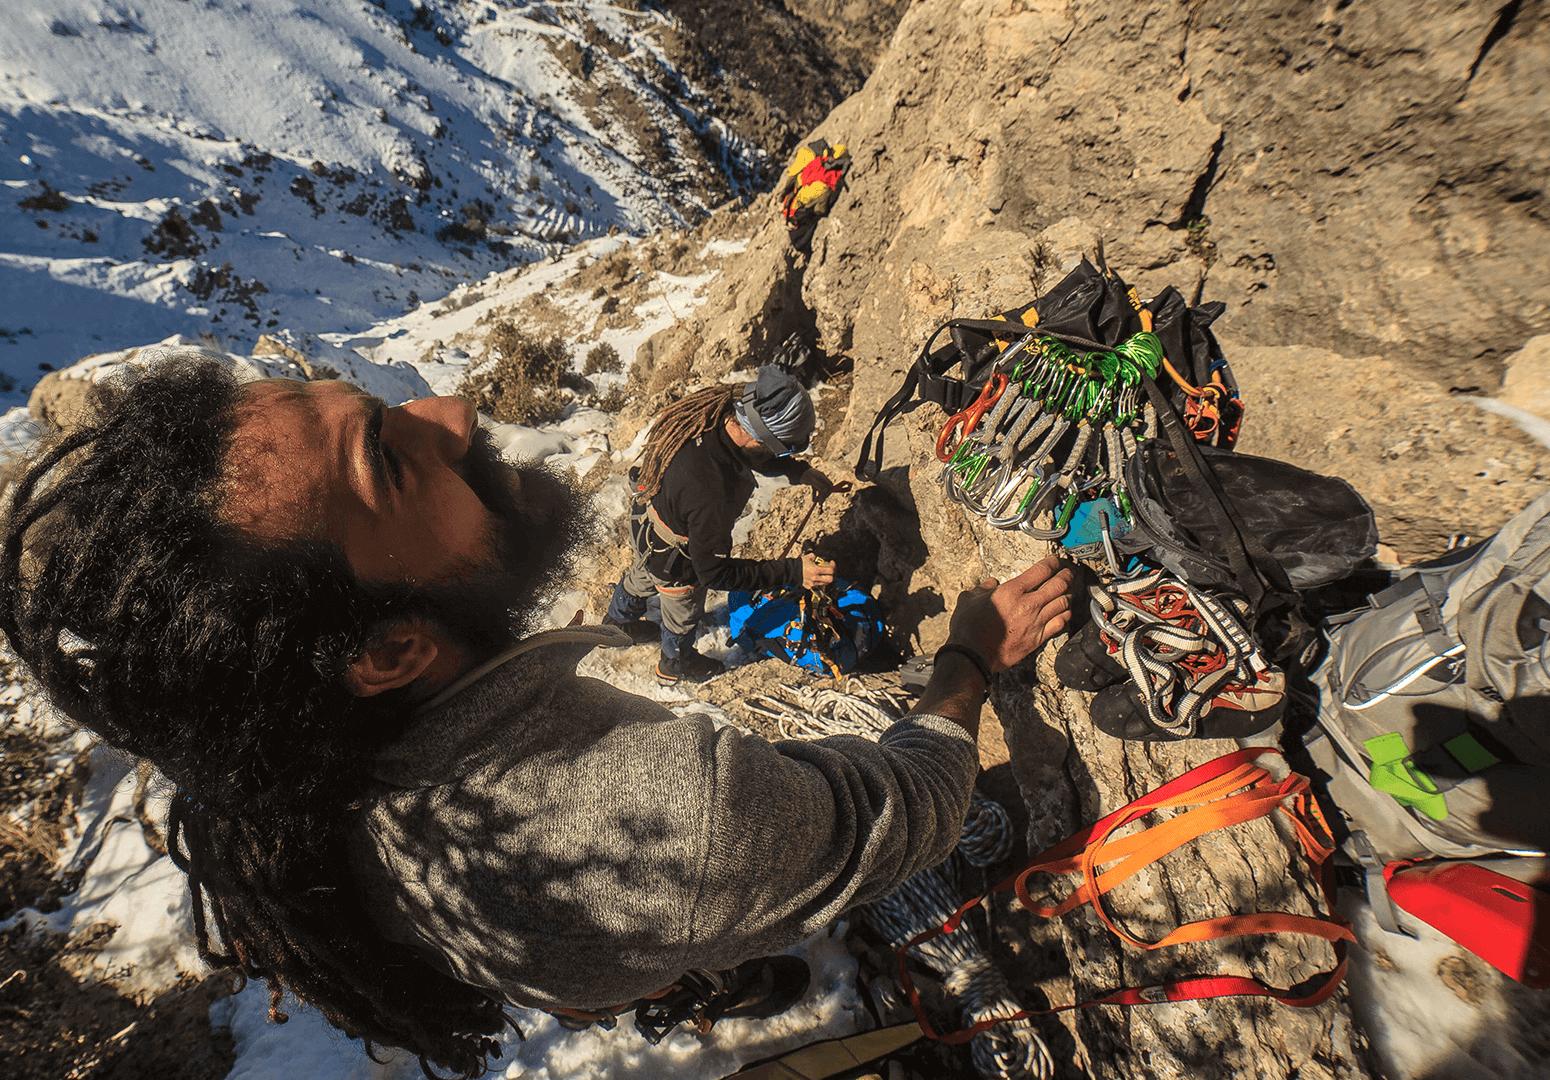 d211f-56735-climbing.png